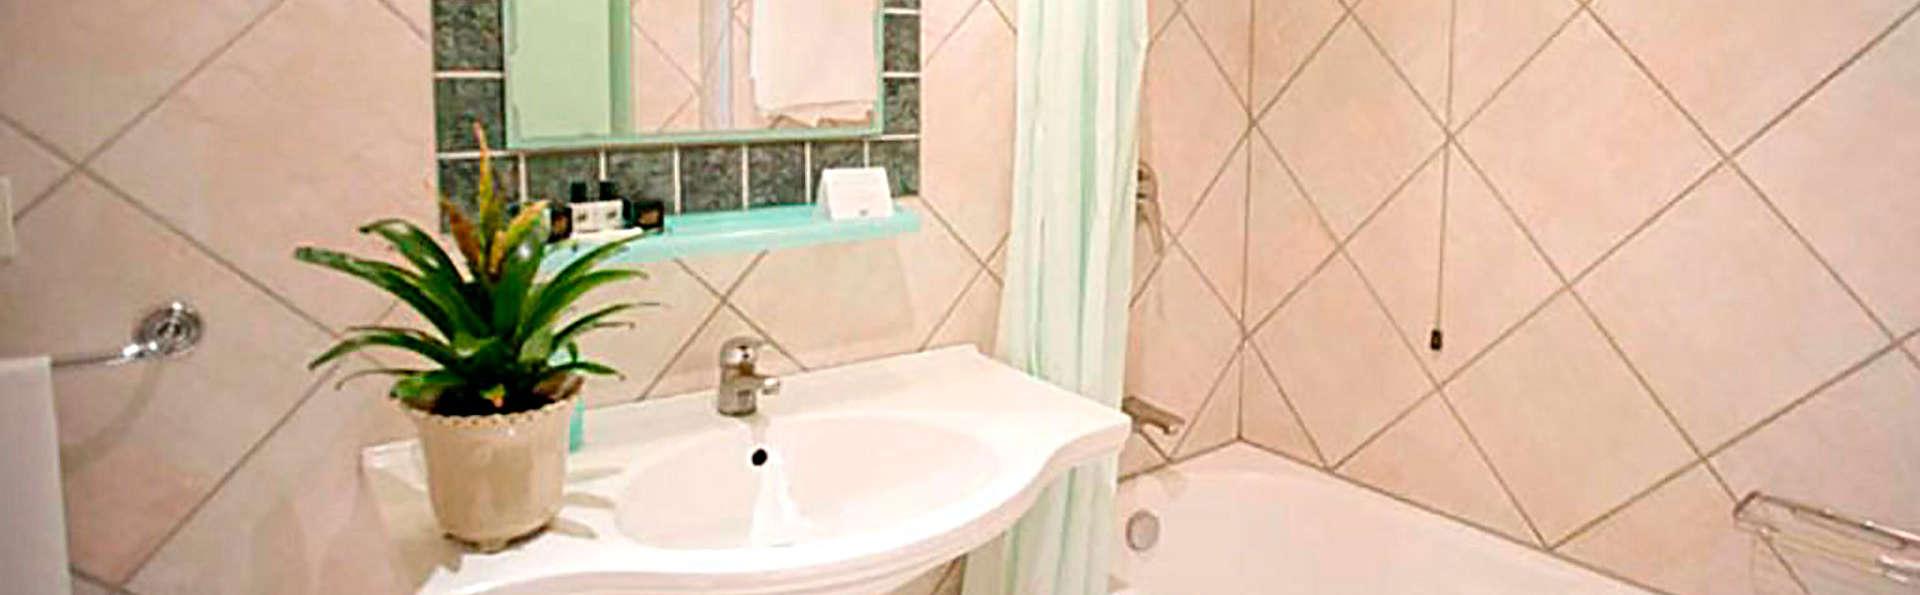 Hotel Sierra Silvana - EDIT_bath.jpg